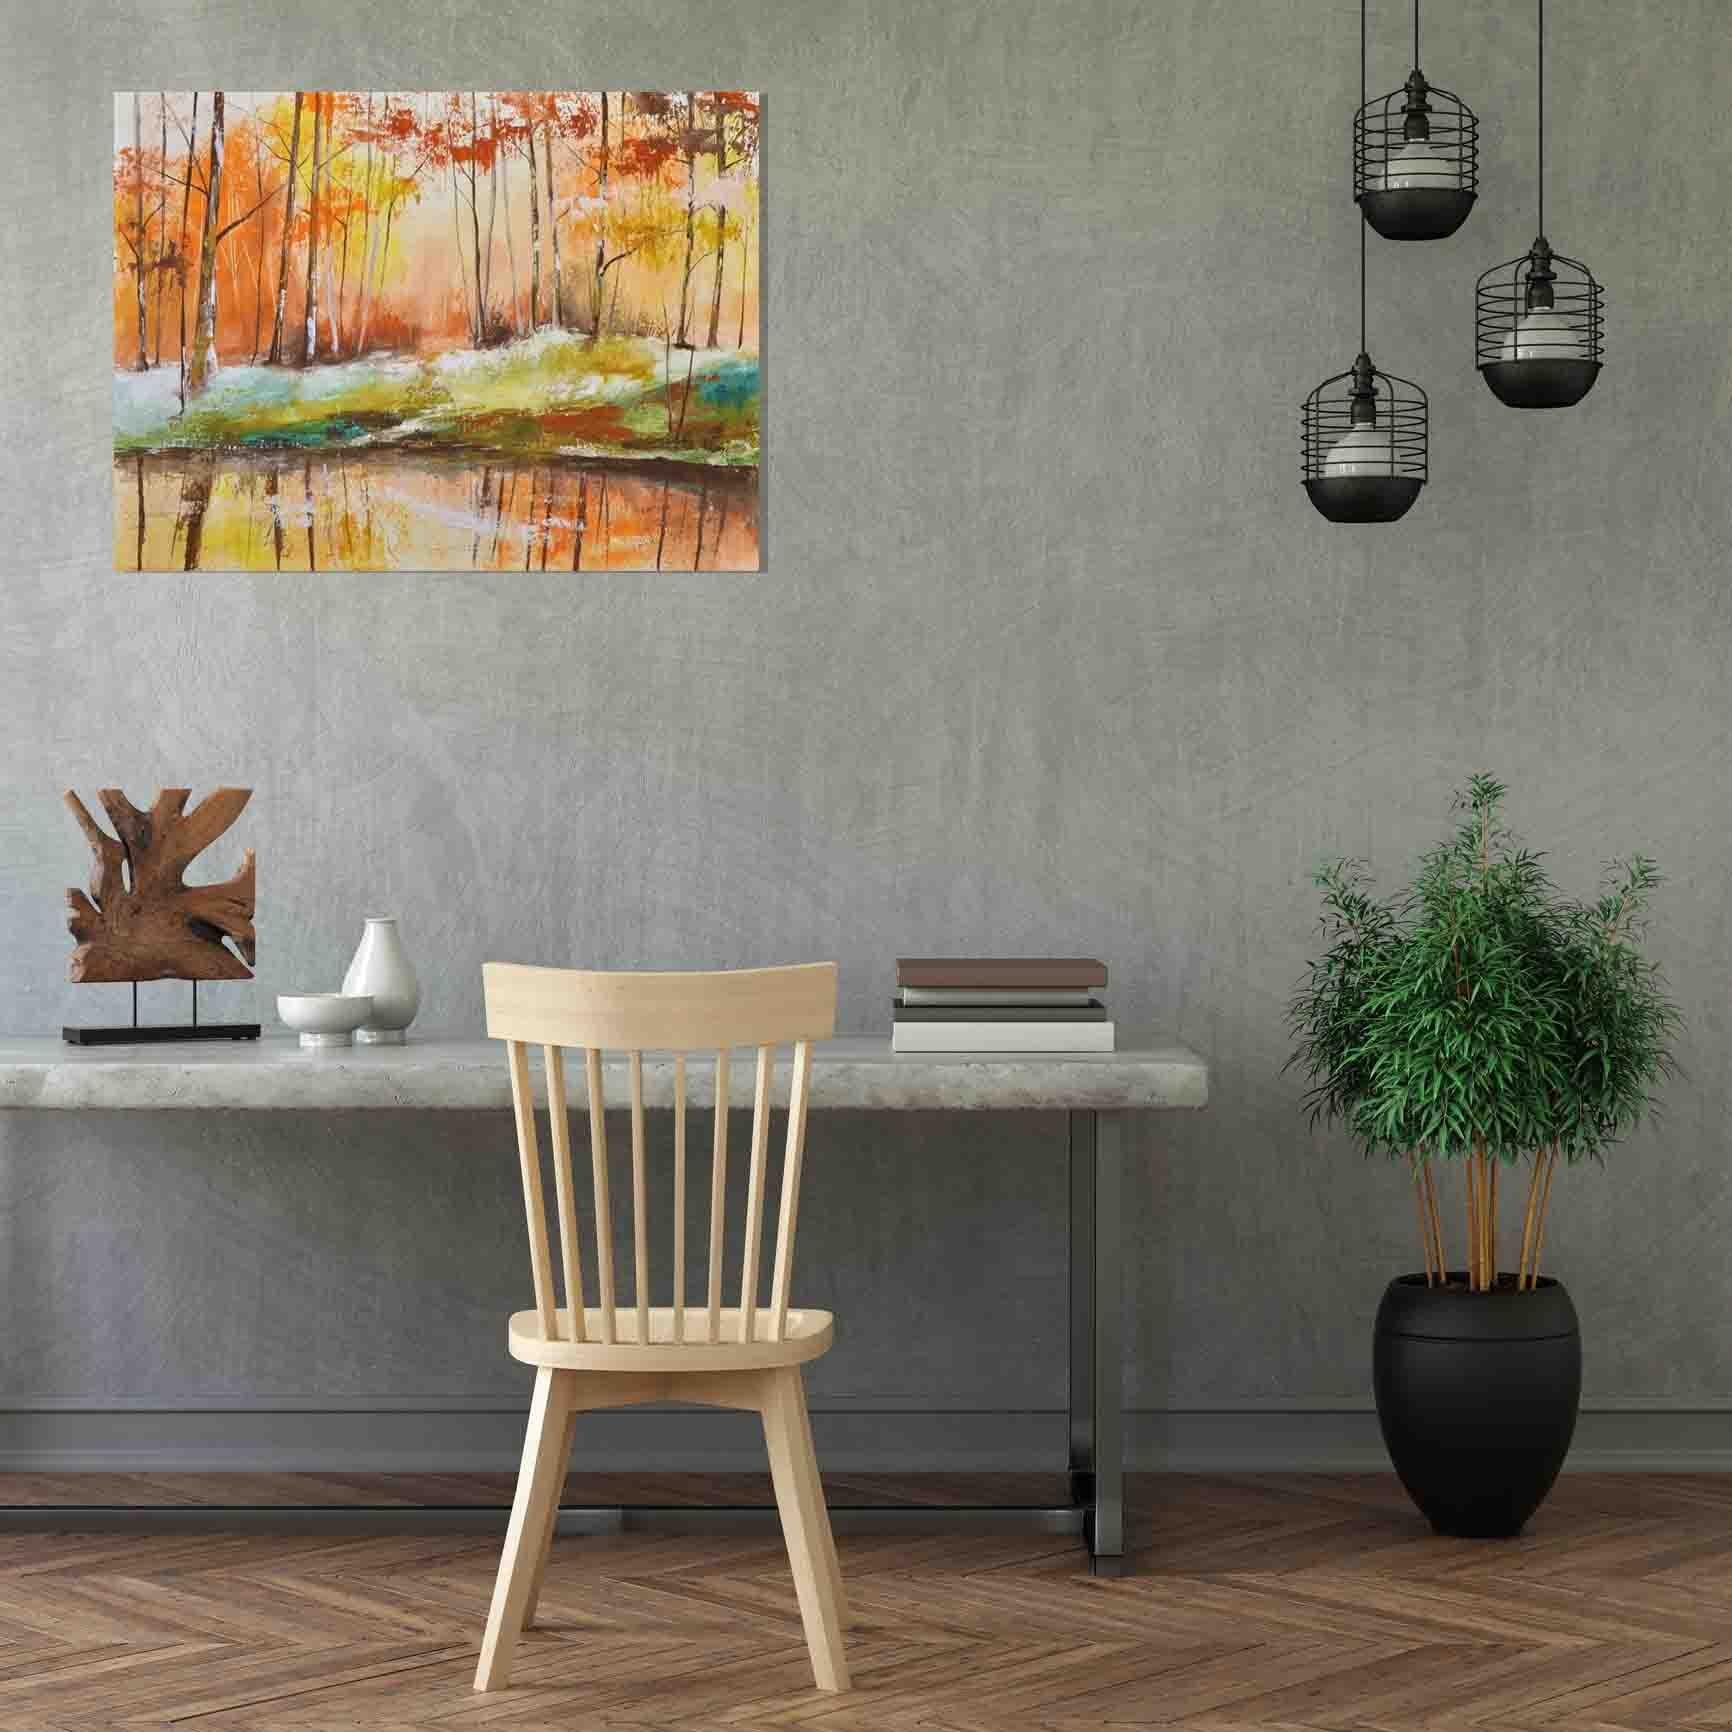 schilderij Forest Impression van Aleksandra